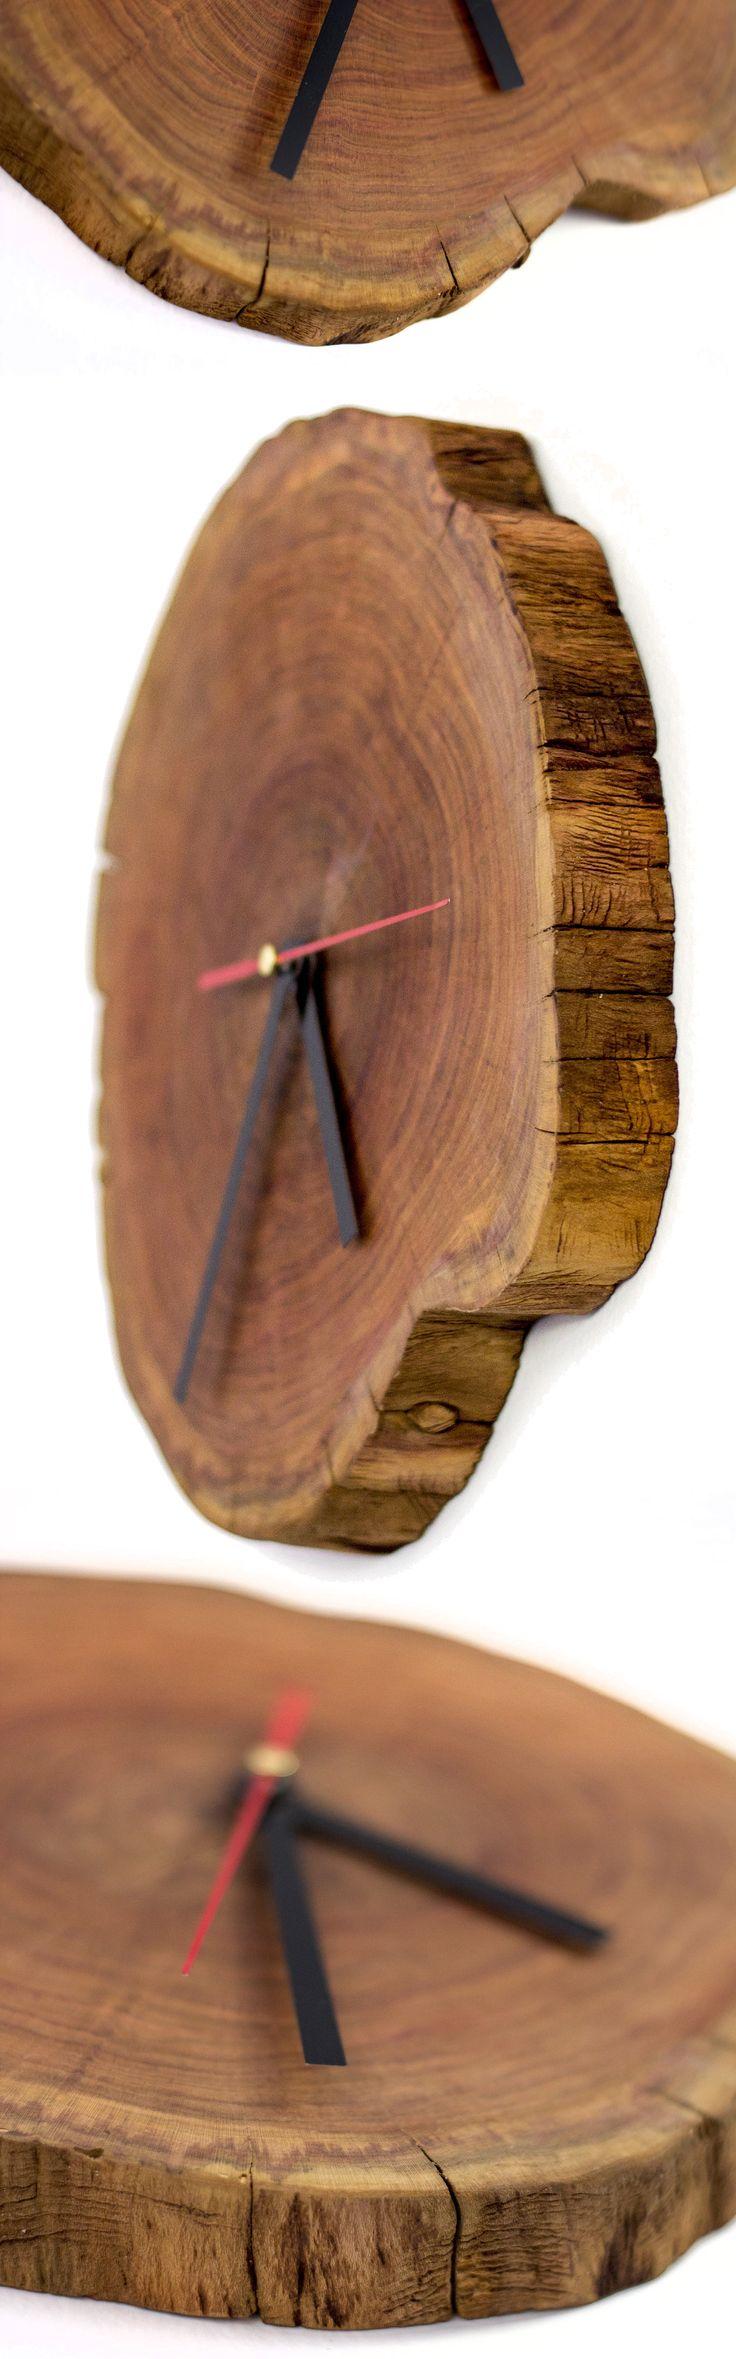 Wooden clock Kitchen Wall Clocks Home Decor Vintage Clock Antique Wall Clocks Mantel Clock Retro Rustic Gift